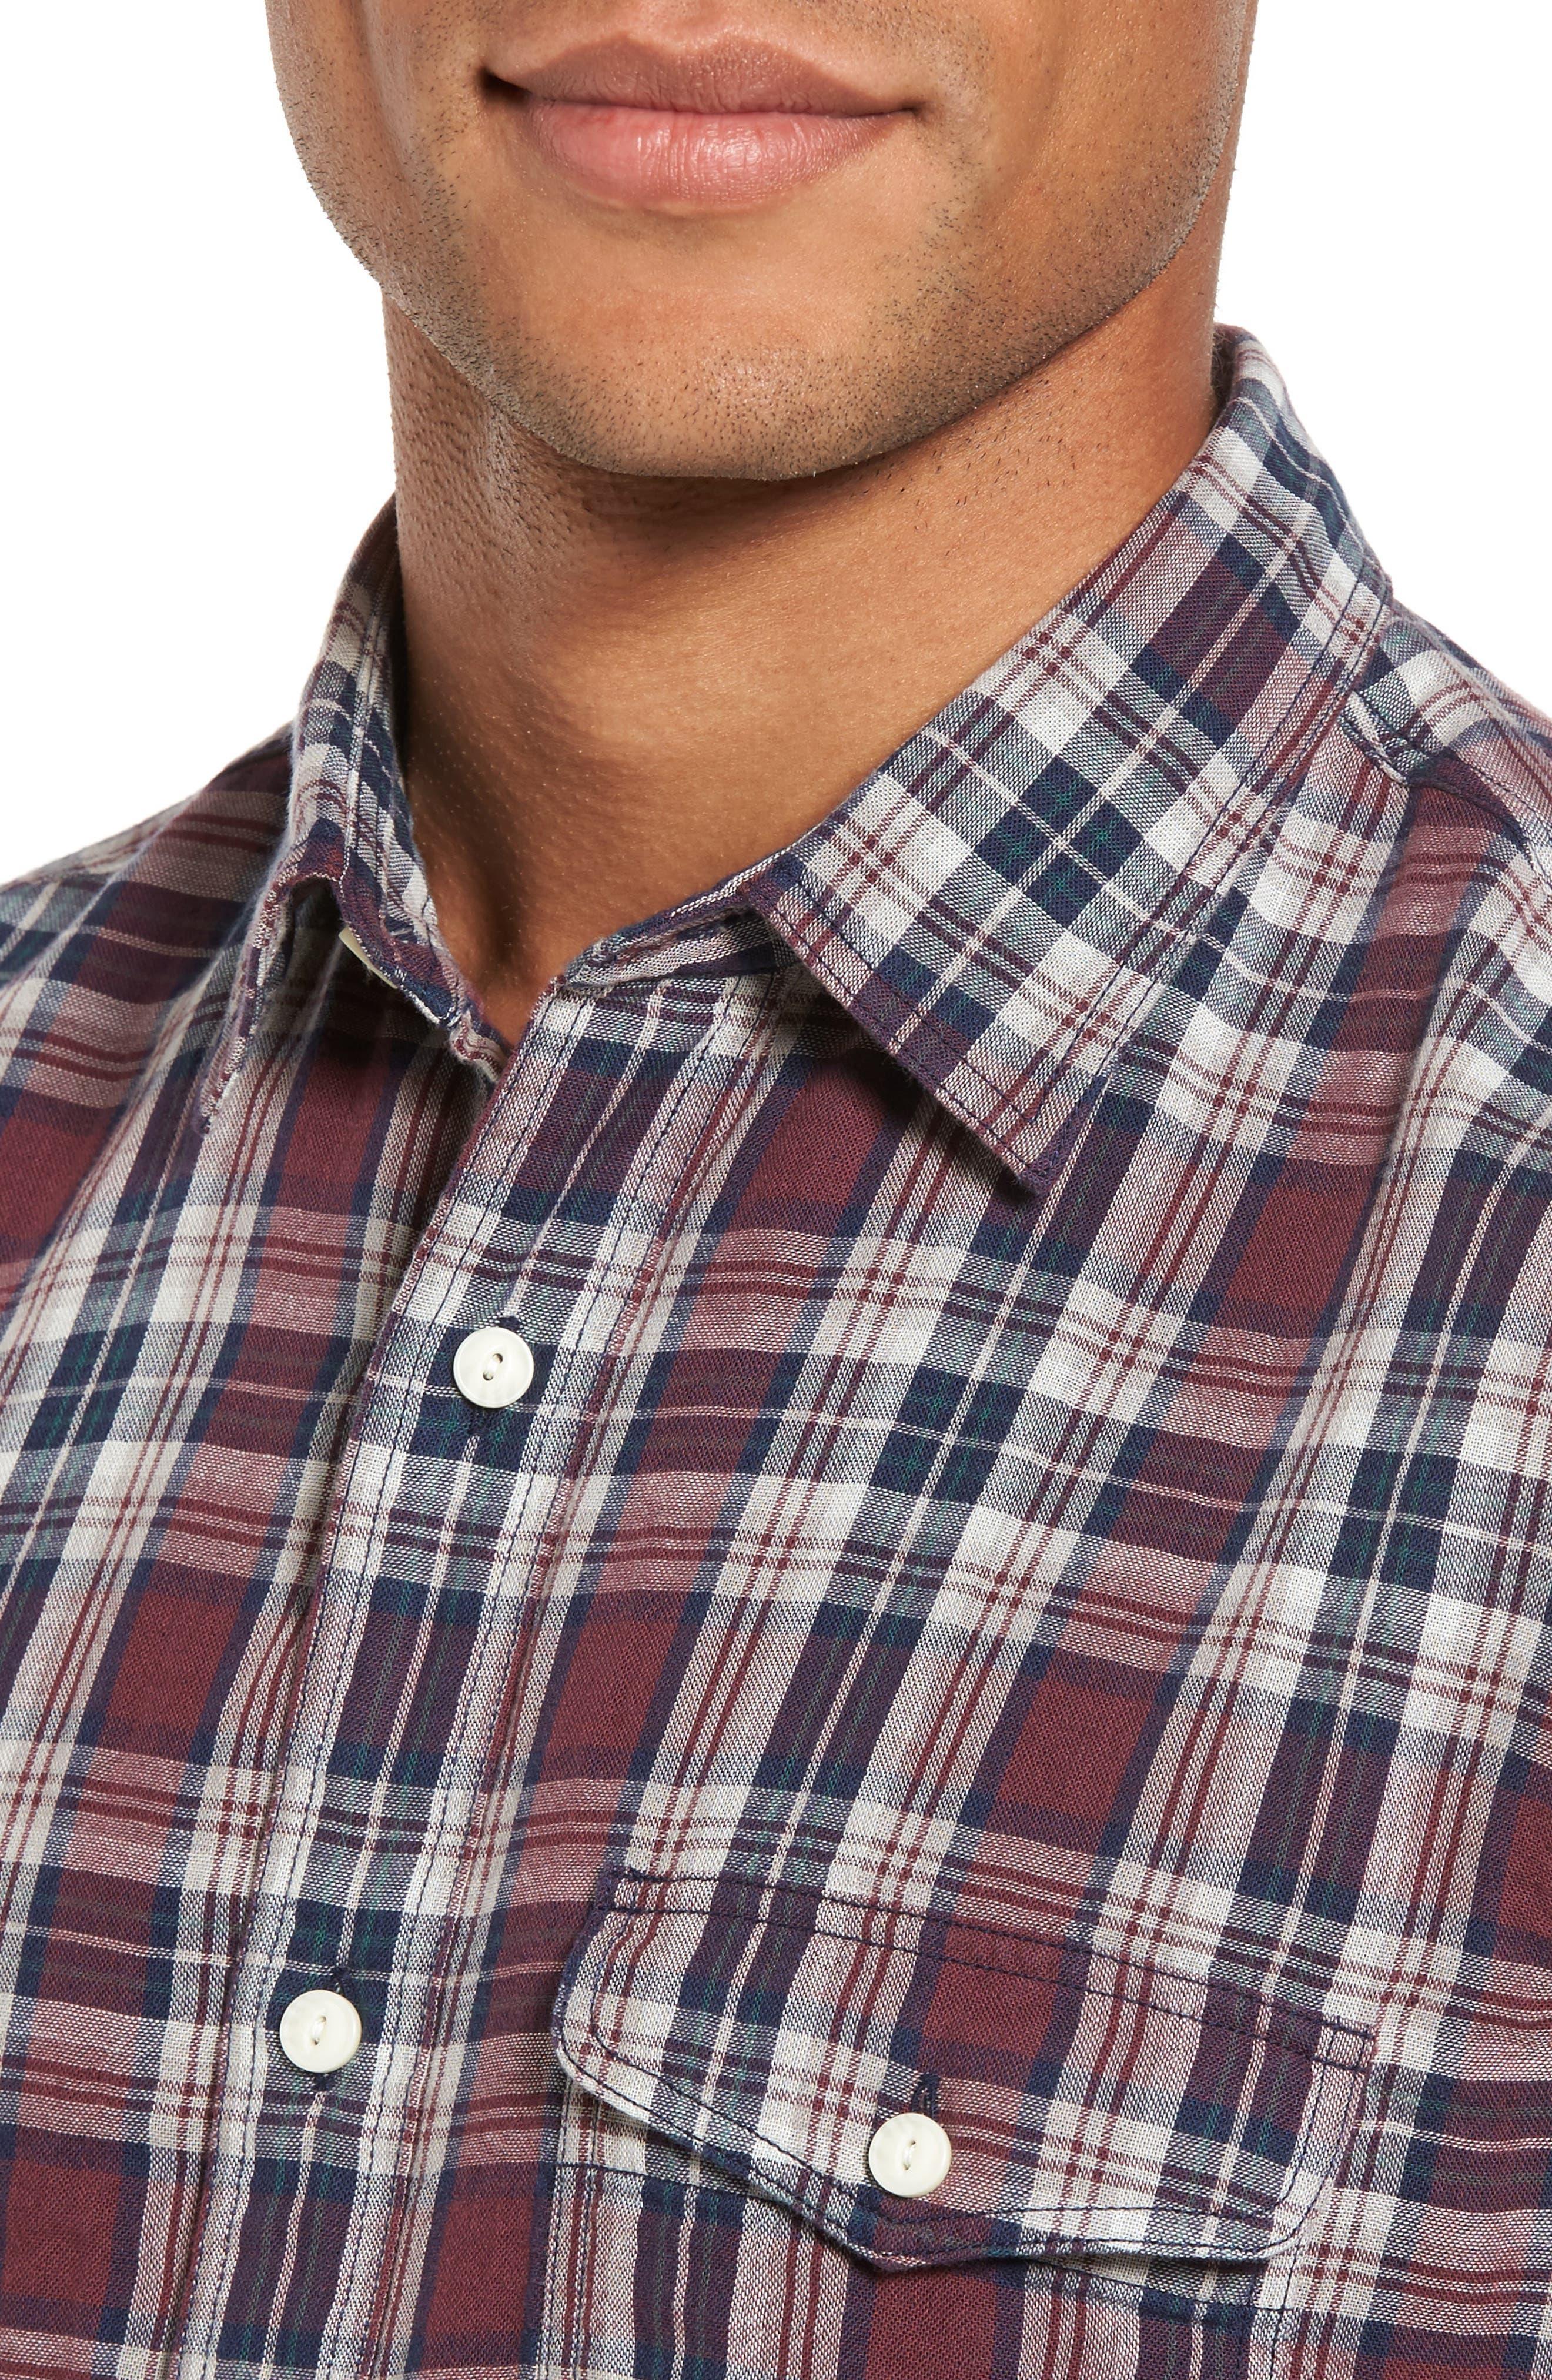 Lumber Duofold Slim Fit Plaid Shirt,                             Alternate thumbnail 4, color,                             938